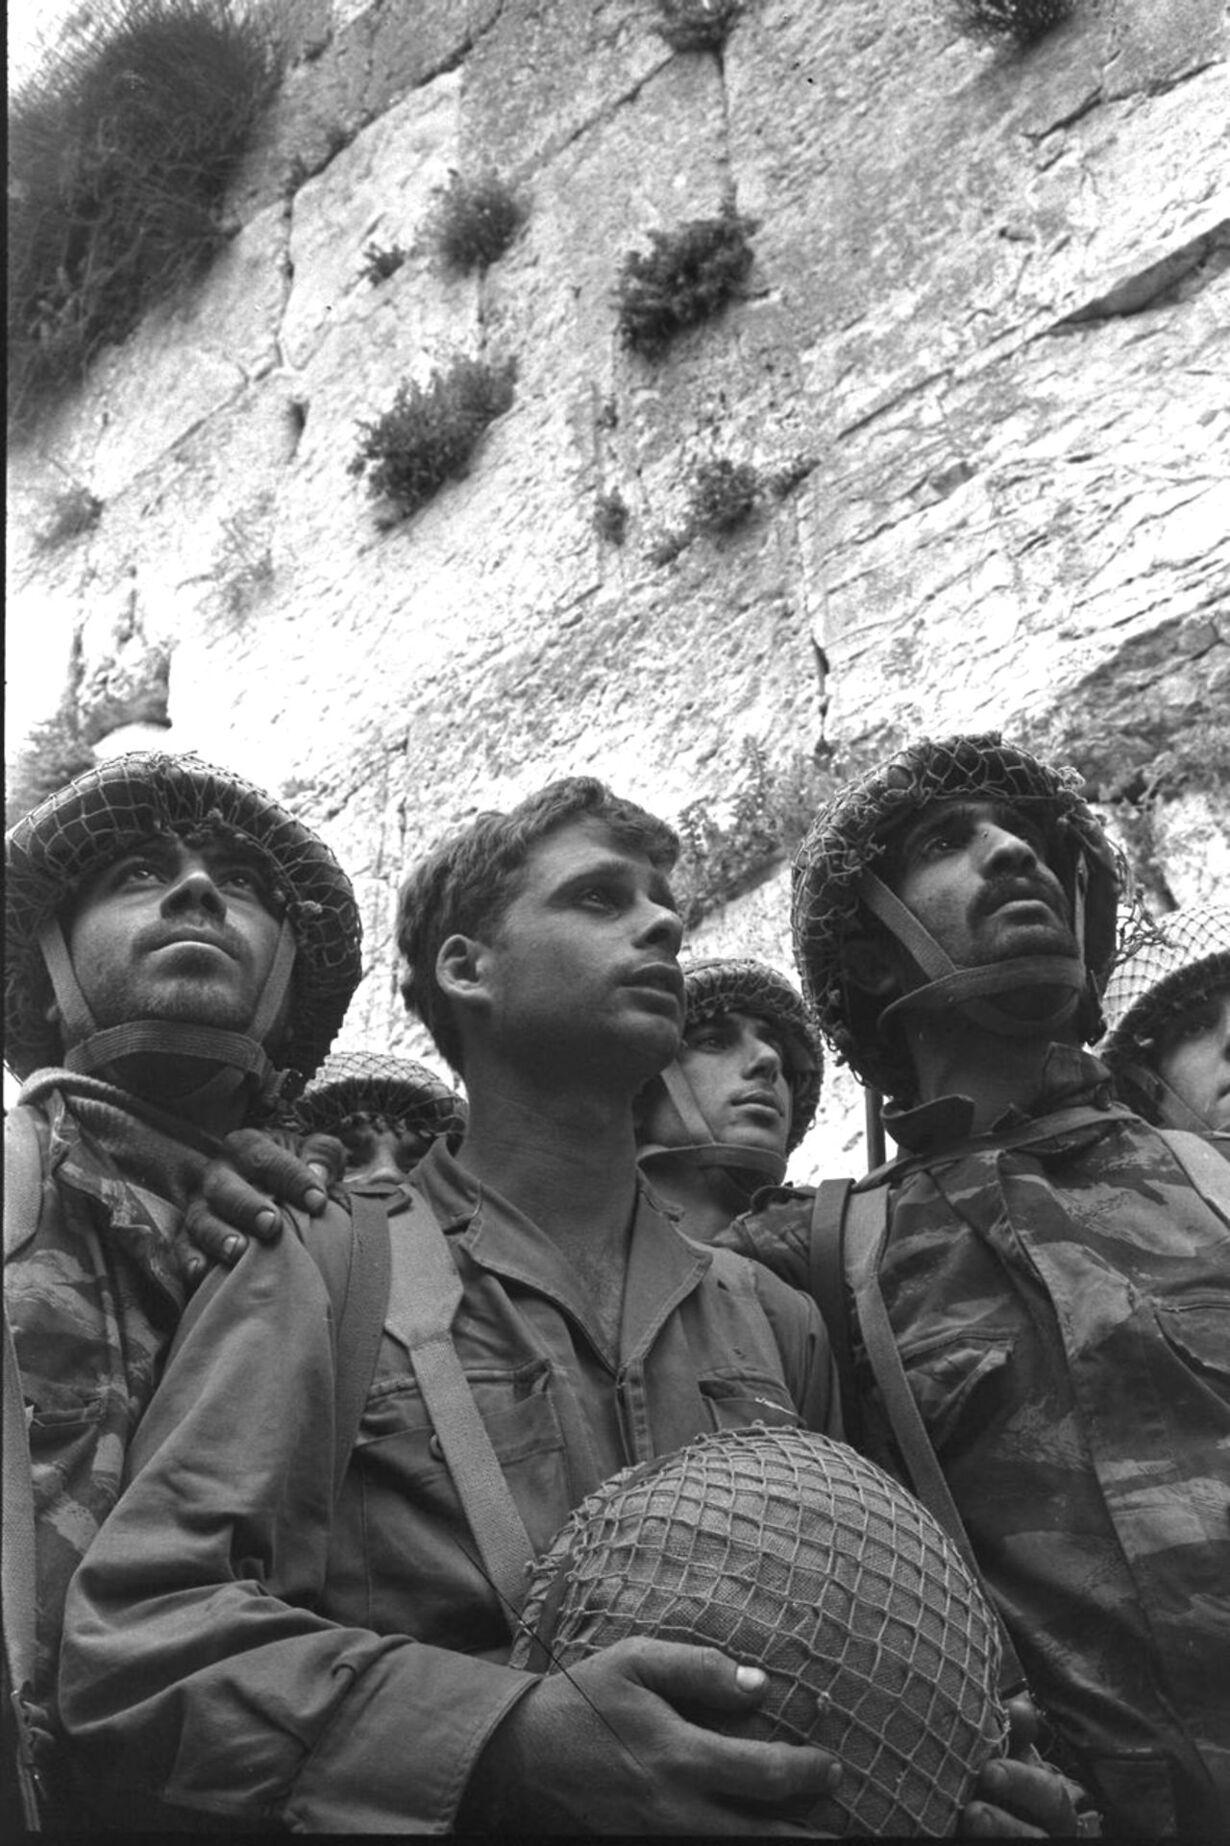 FILES-ISRAEL-PALESTINIAN-6DAY WAR-50 YEARS